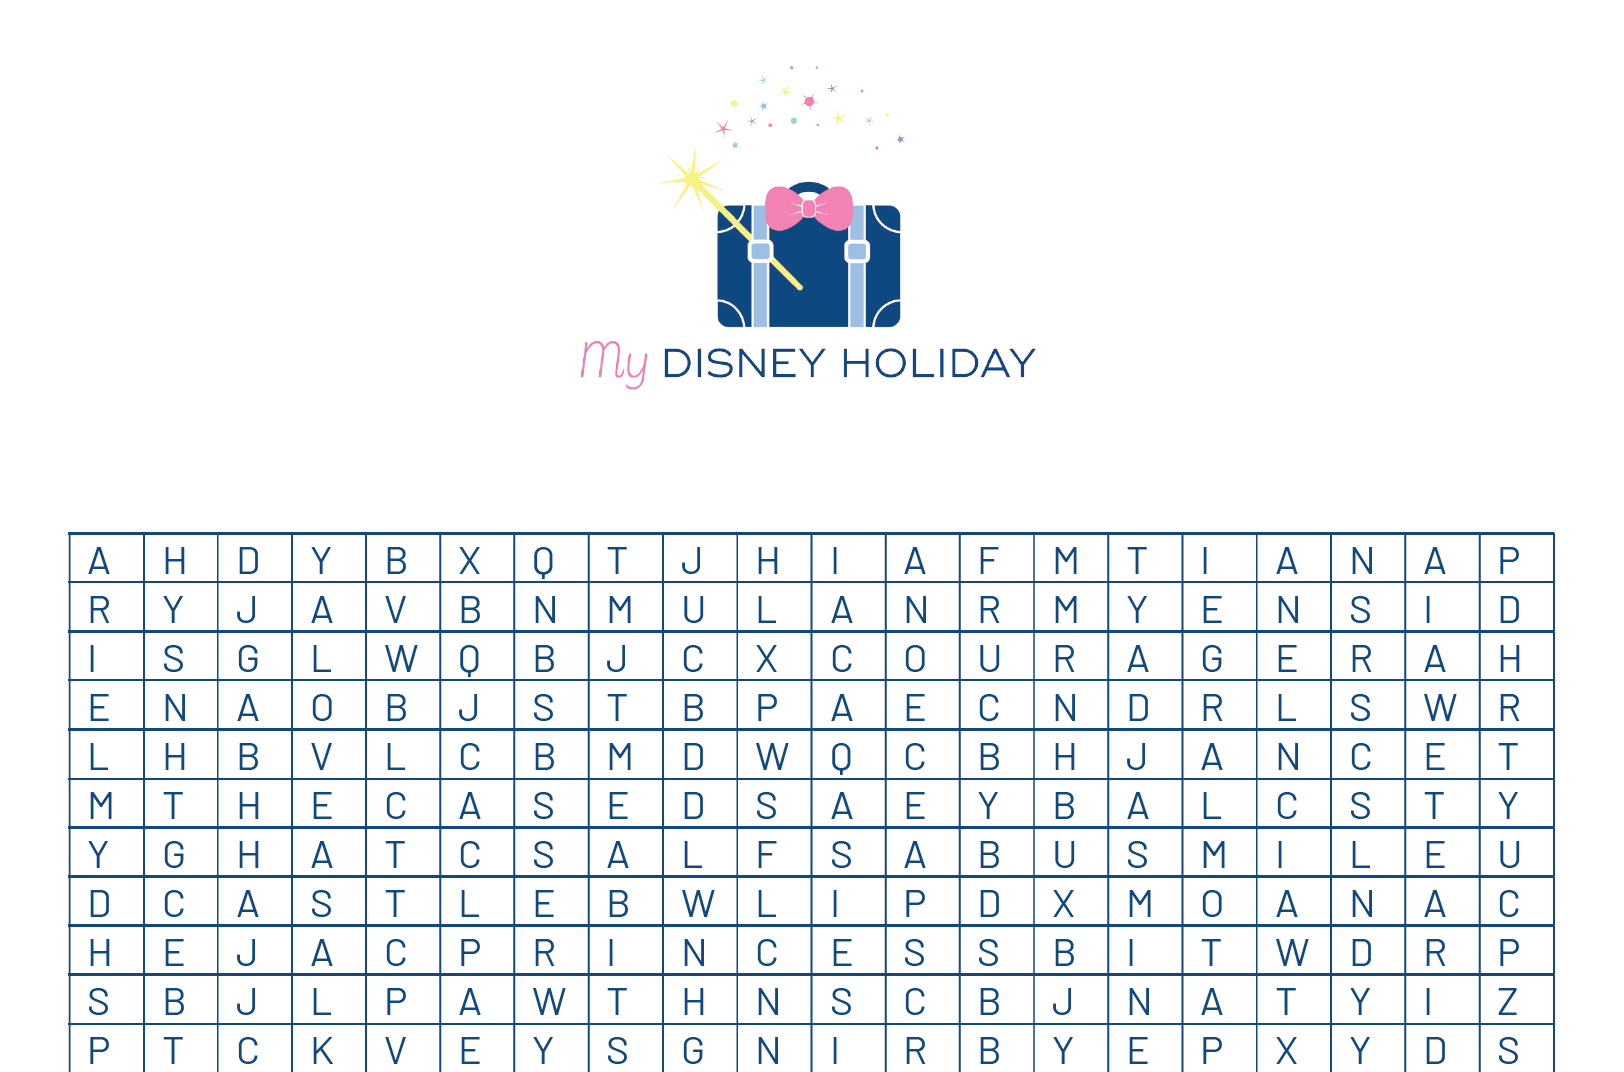 Princess Wordsearch  Free Printable  My Disney Holiday throughout Disney Princess Word Search Printable